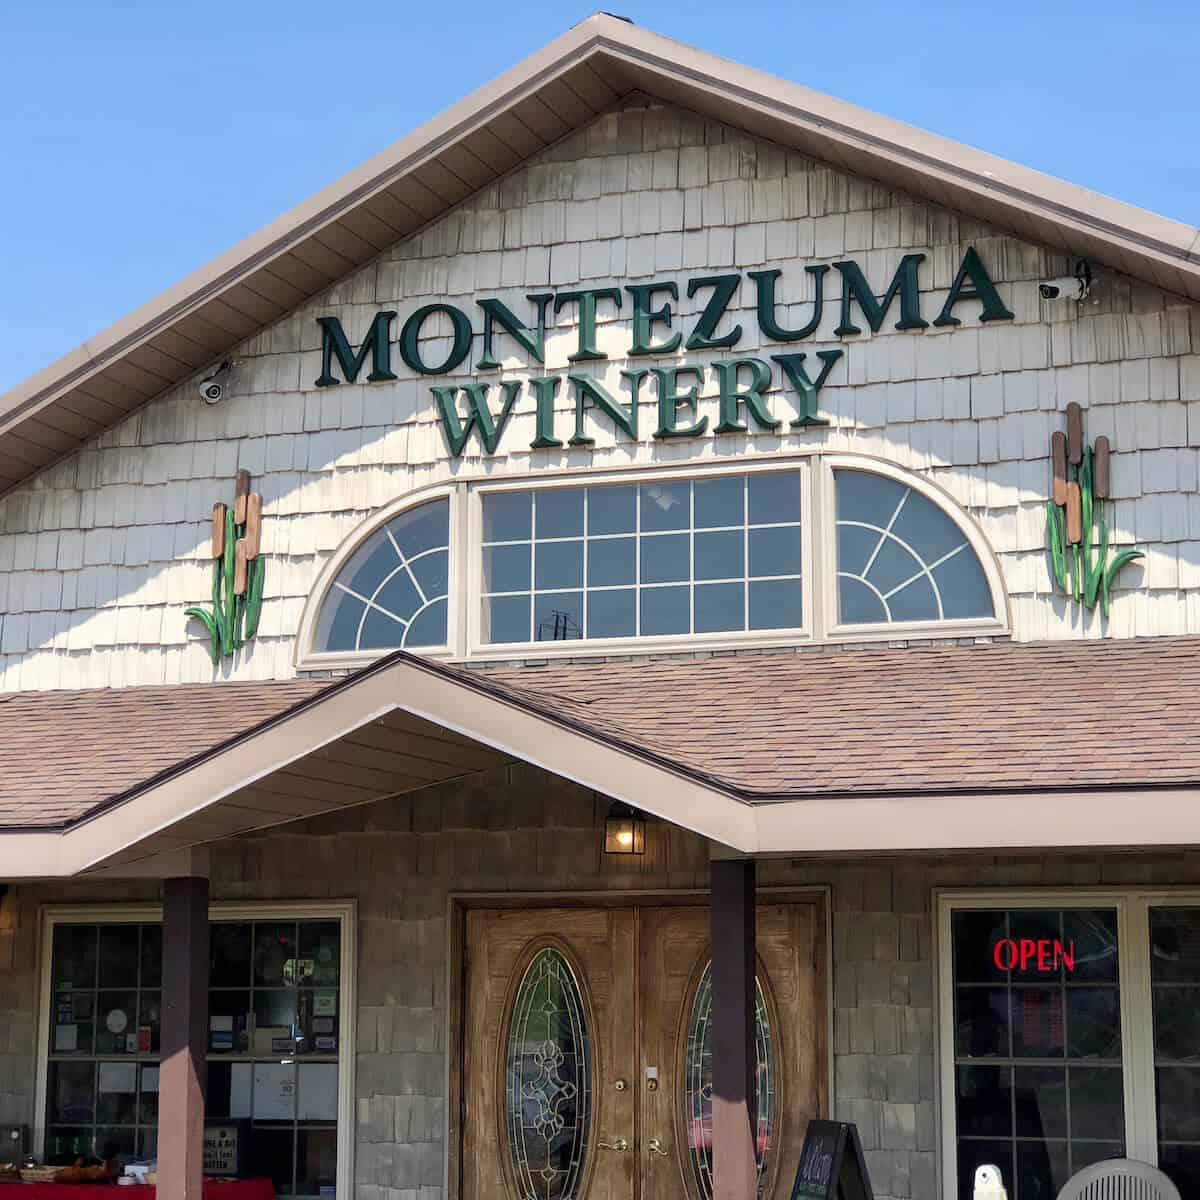 Montezuma Winery storefront.